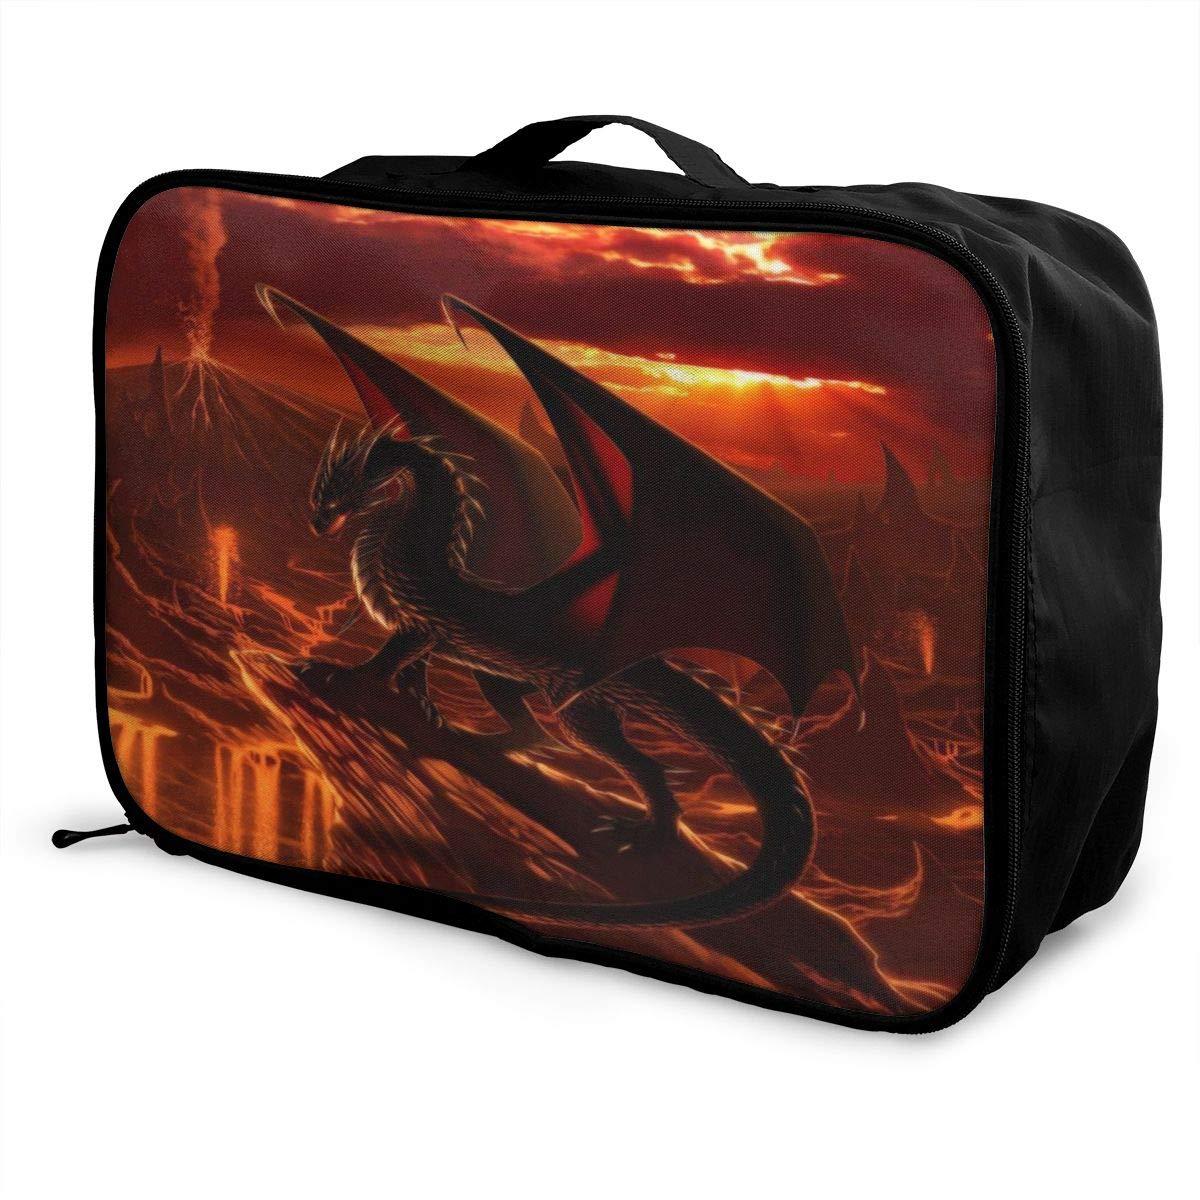 Cheny God-Zilla Travel Duffel Bag Lightweight Waterproof Large Capacity Portable Luggage Bag